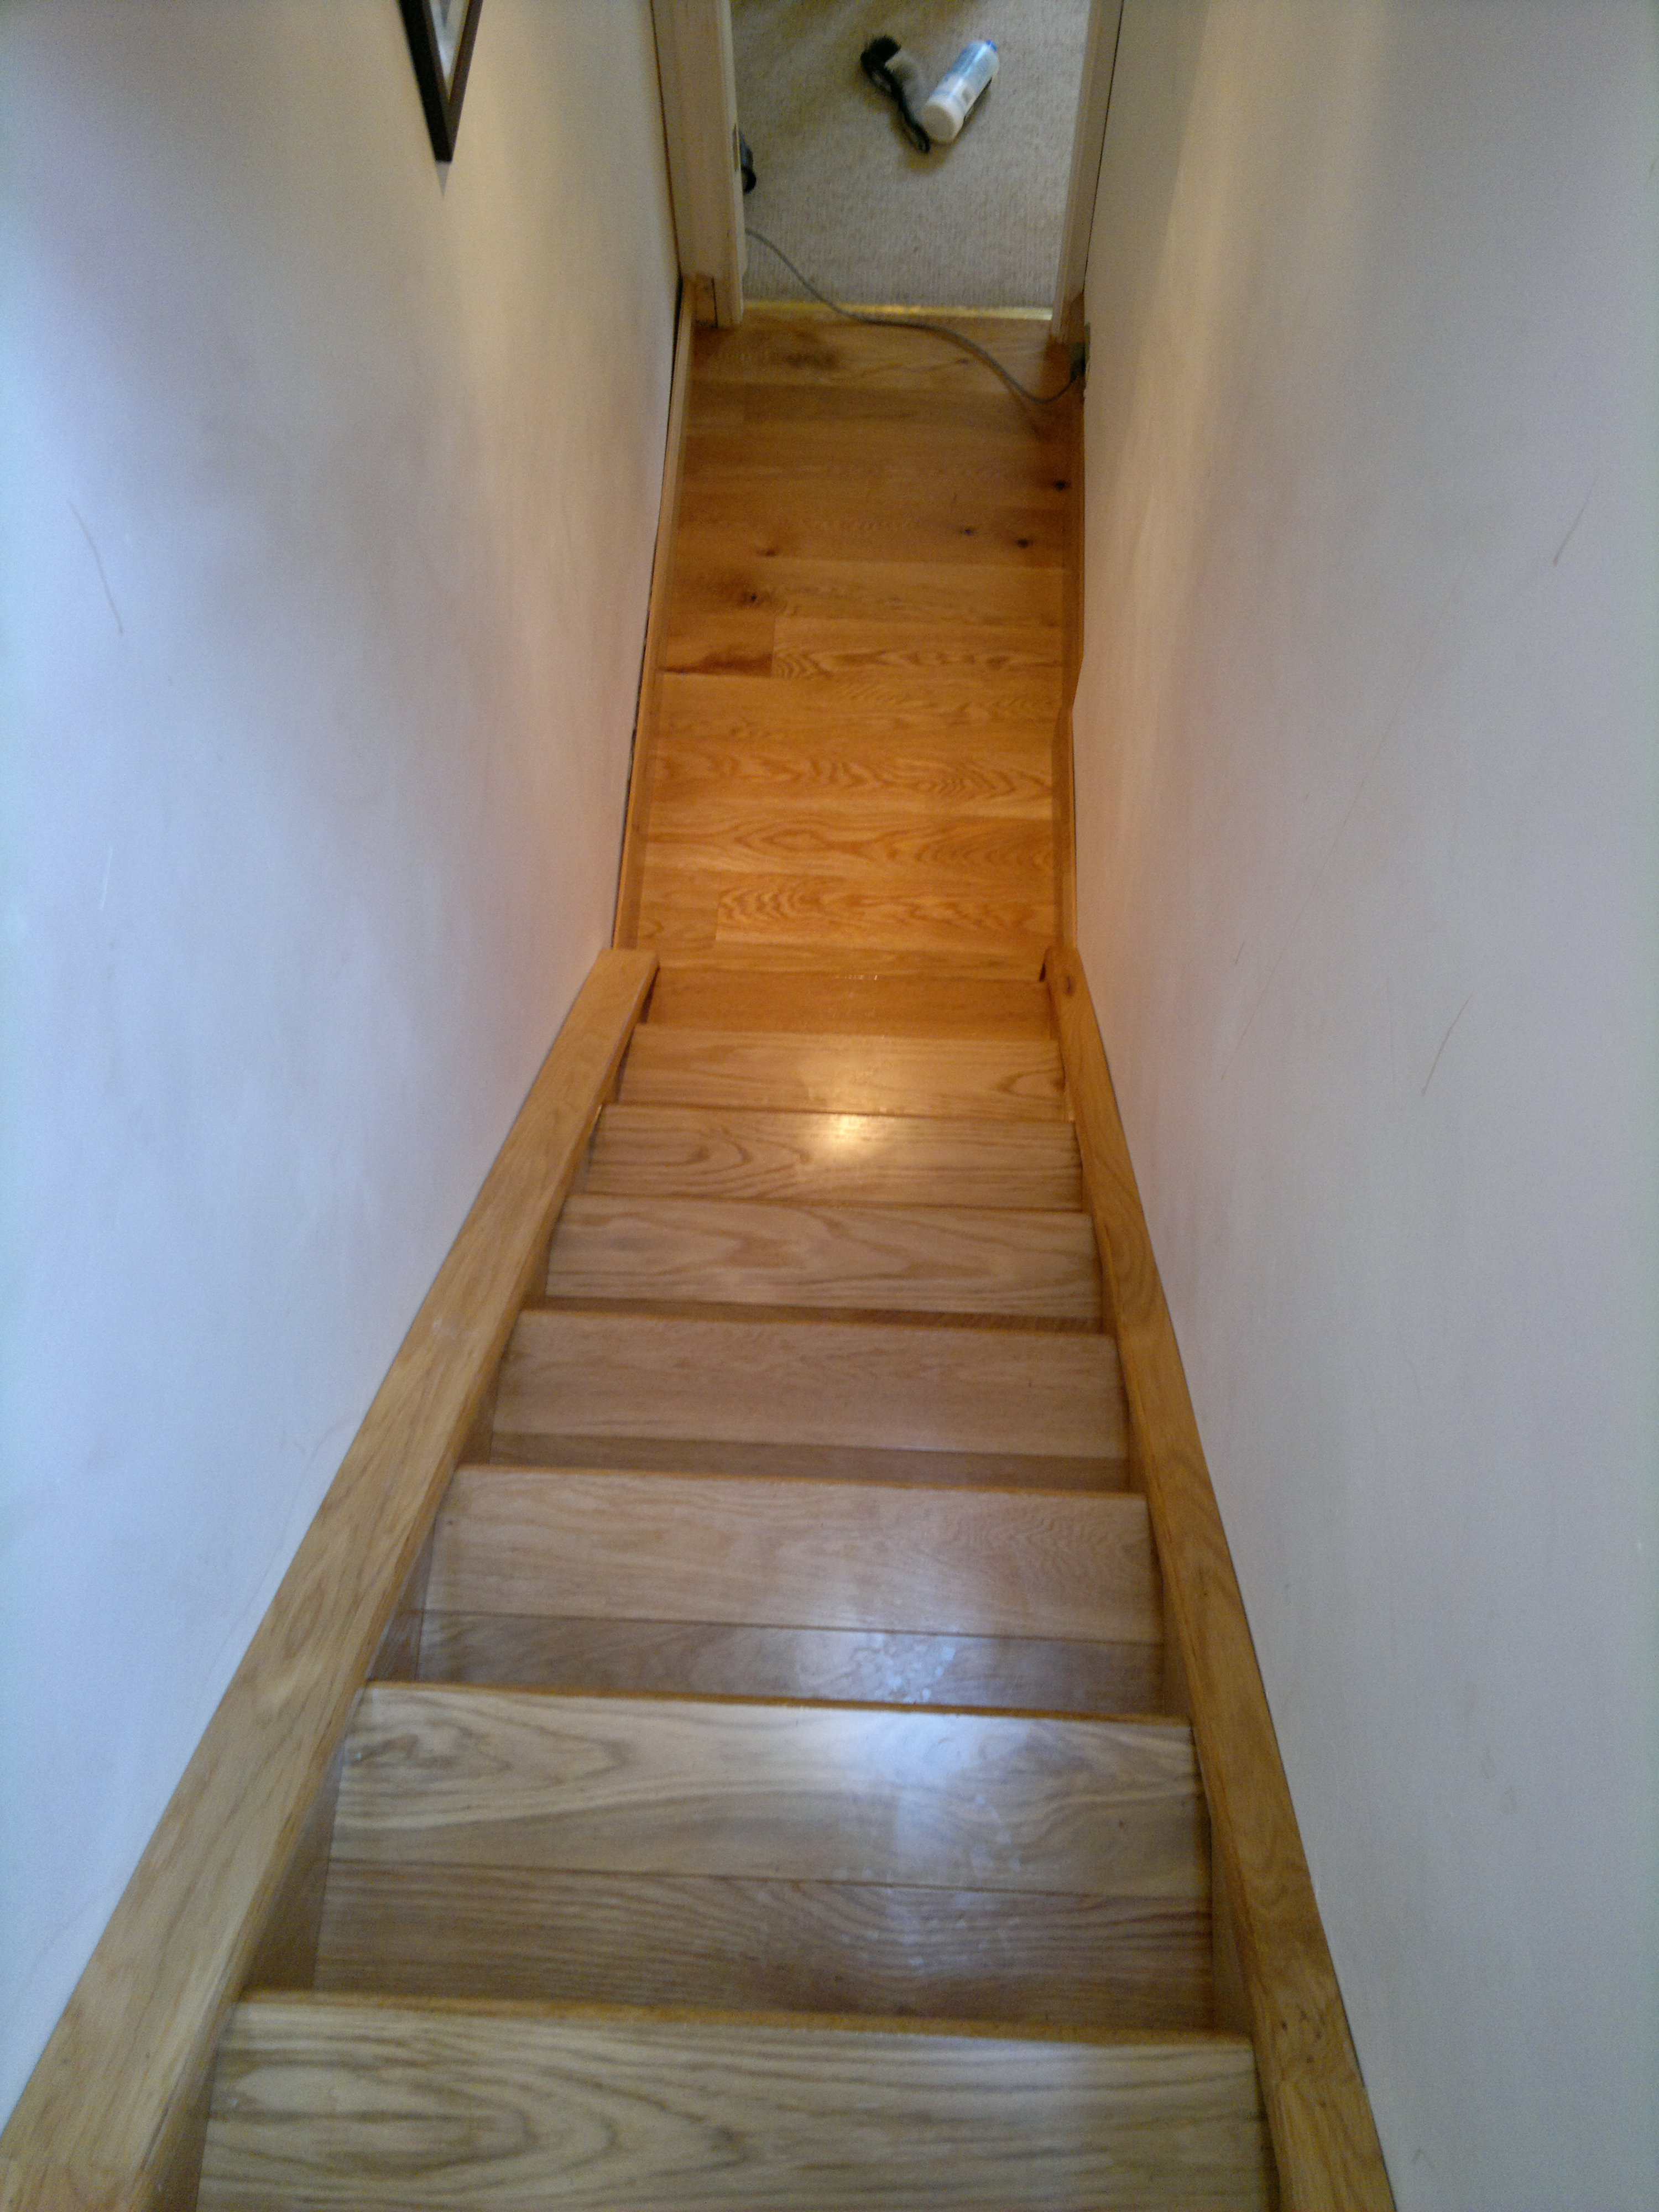 Cedar craft carpentry dublin carpenter doors for Hardwood floors dublin